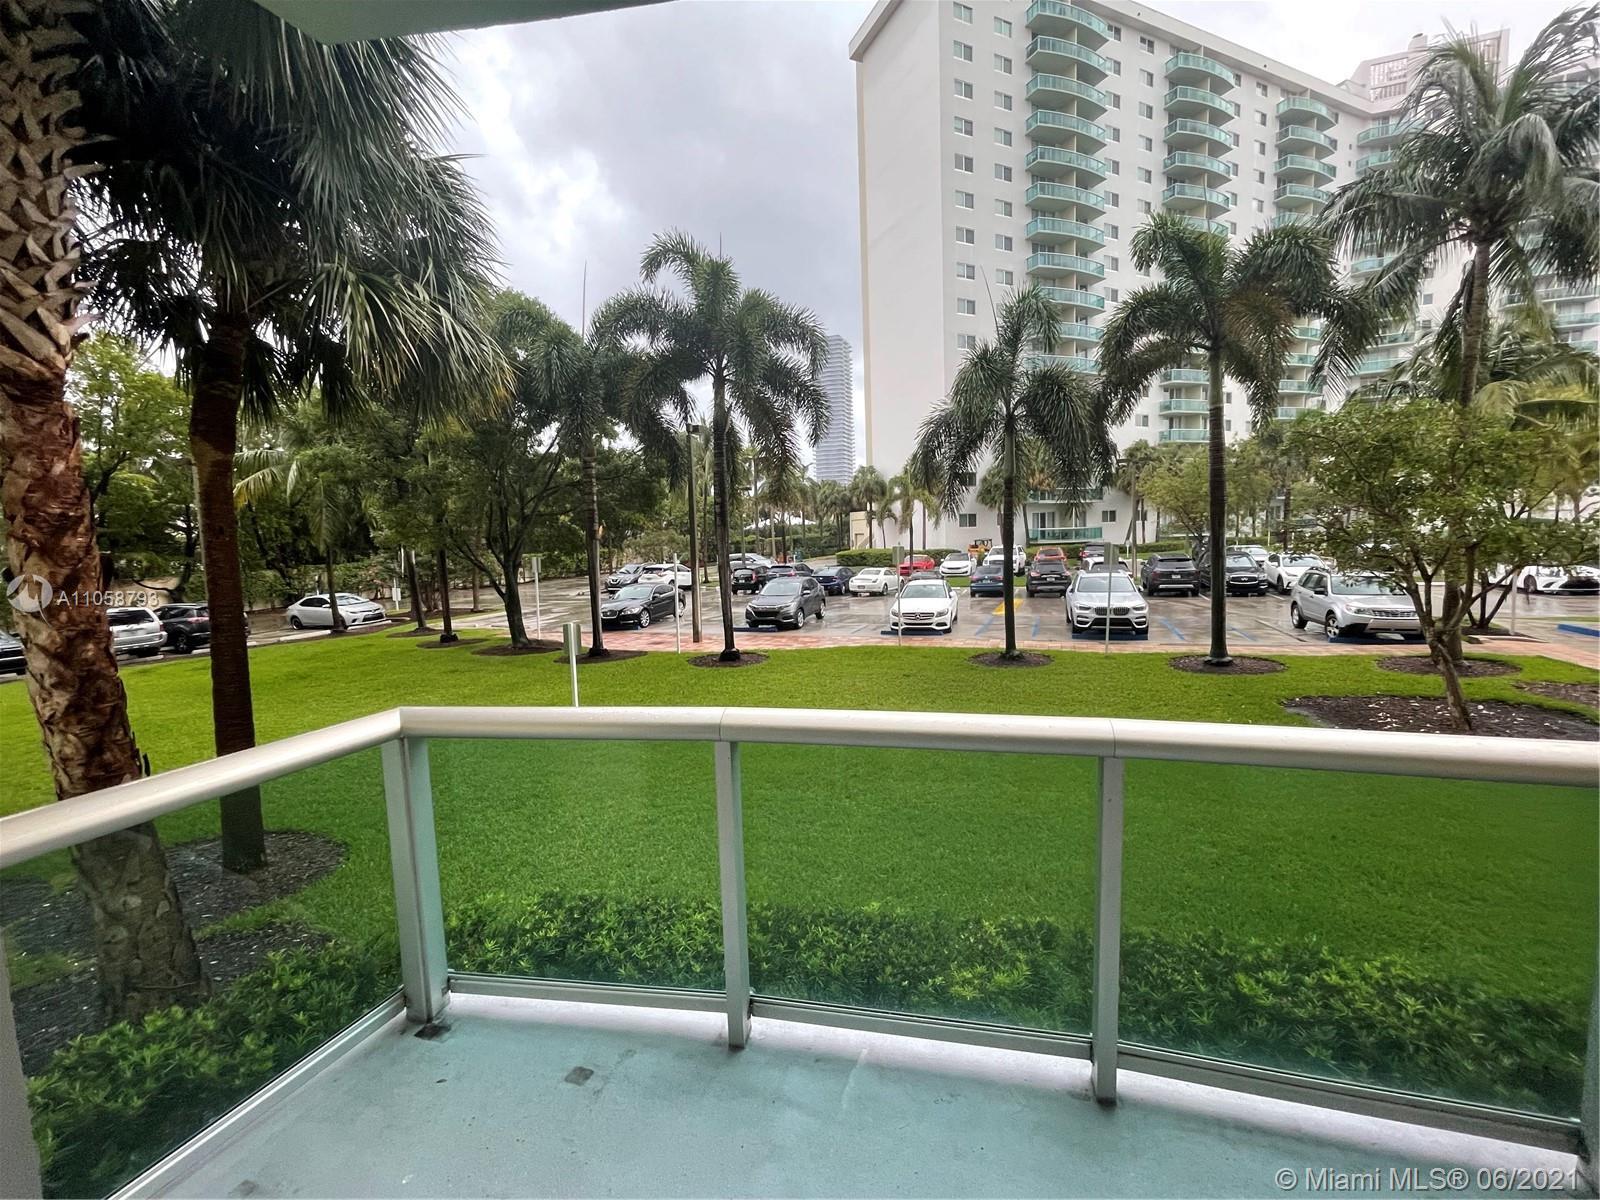 Ocean View A #122 - 19390 Collins Ave #122, Sunny Isles Beach, FL 33160